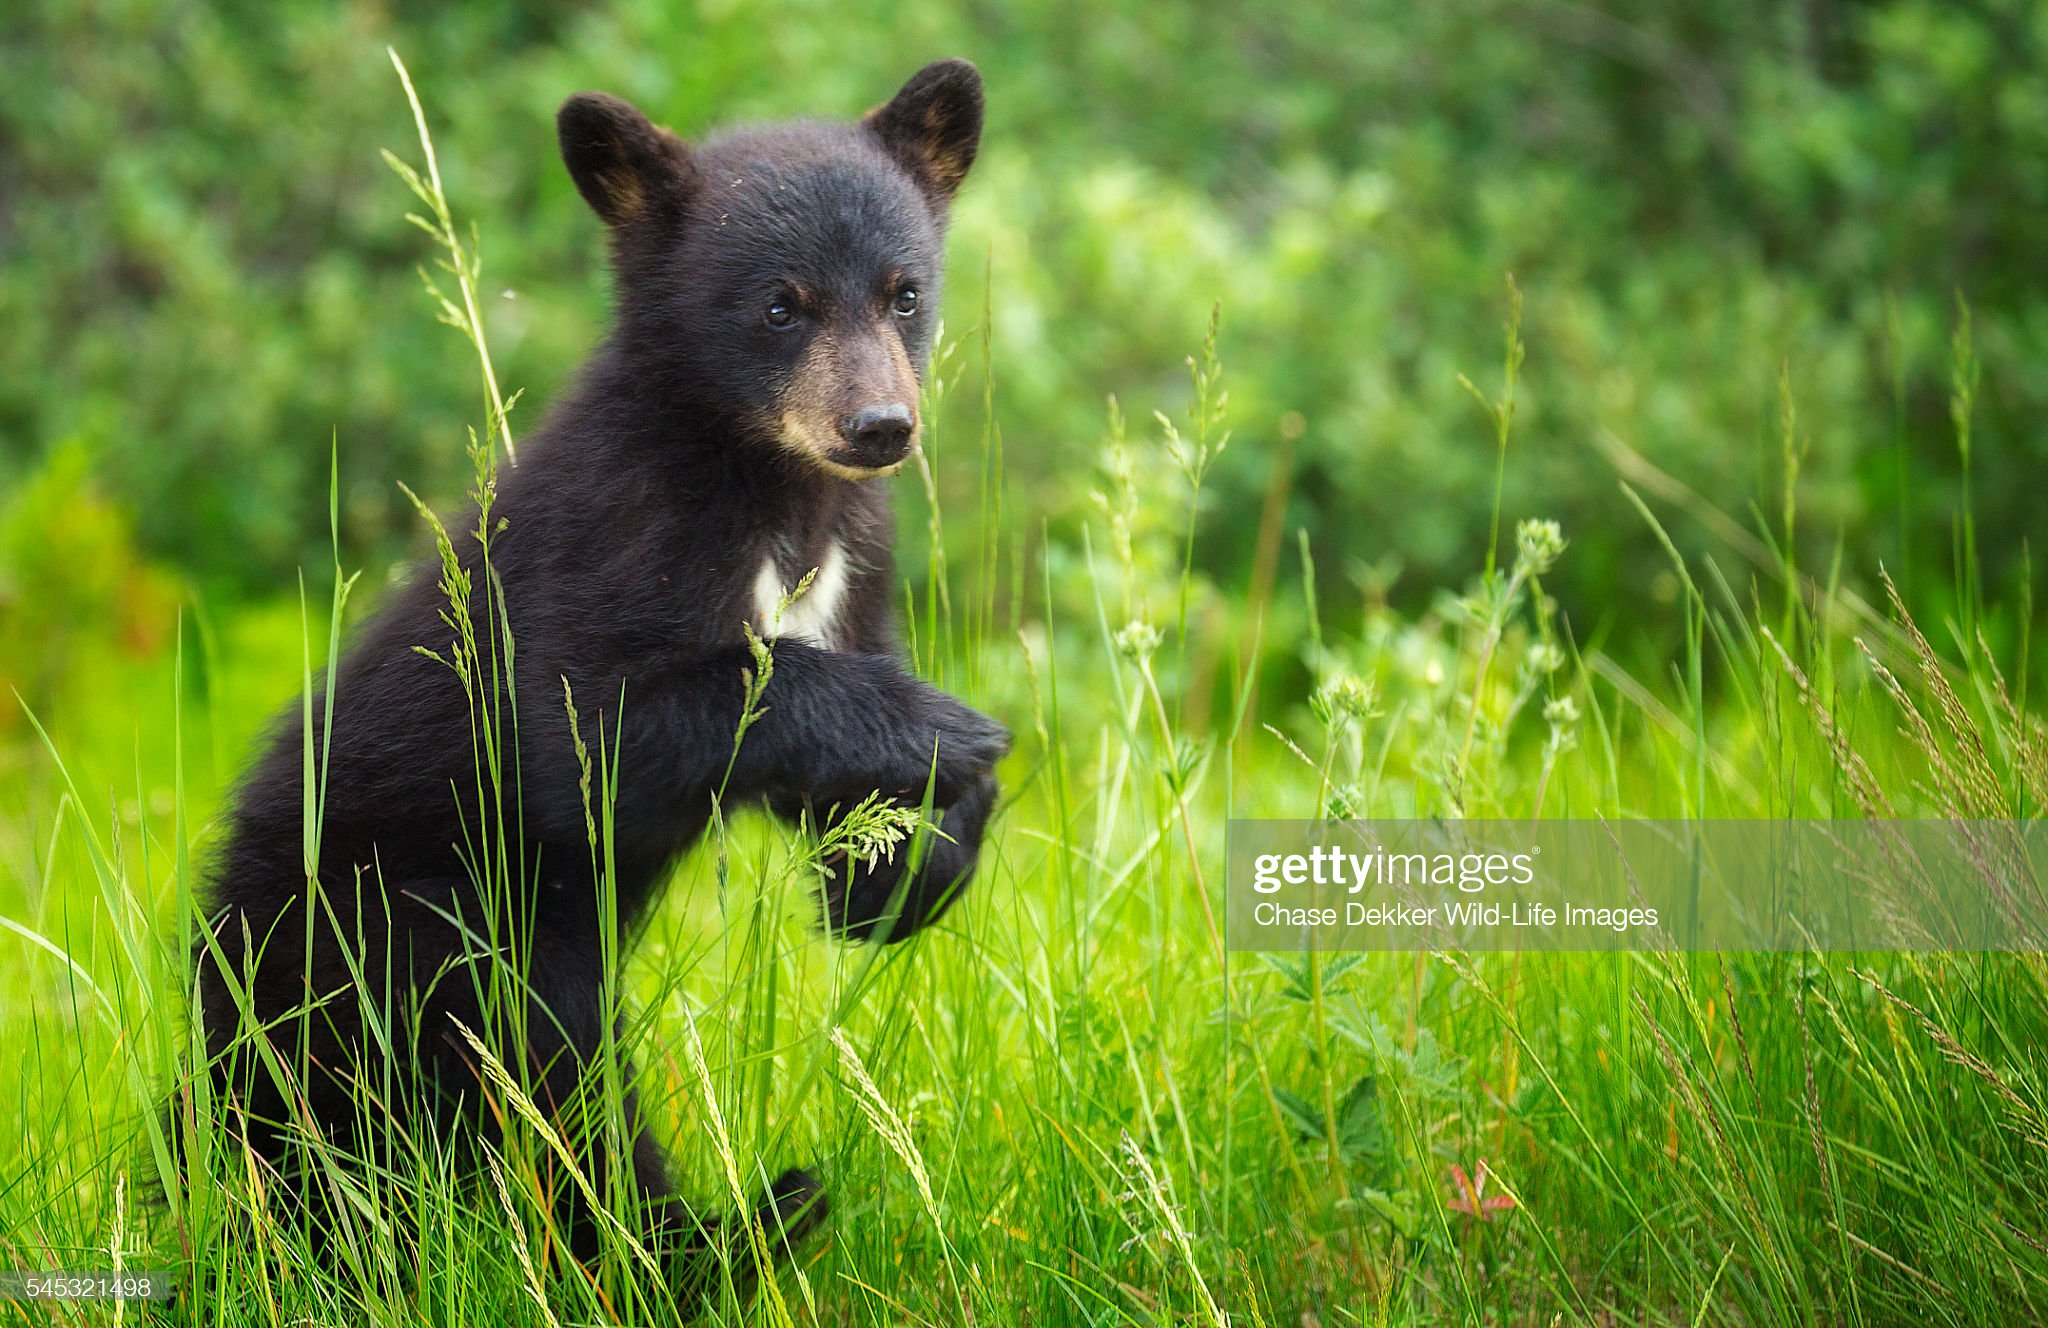 Black Bear Cub : Foto stock